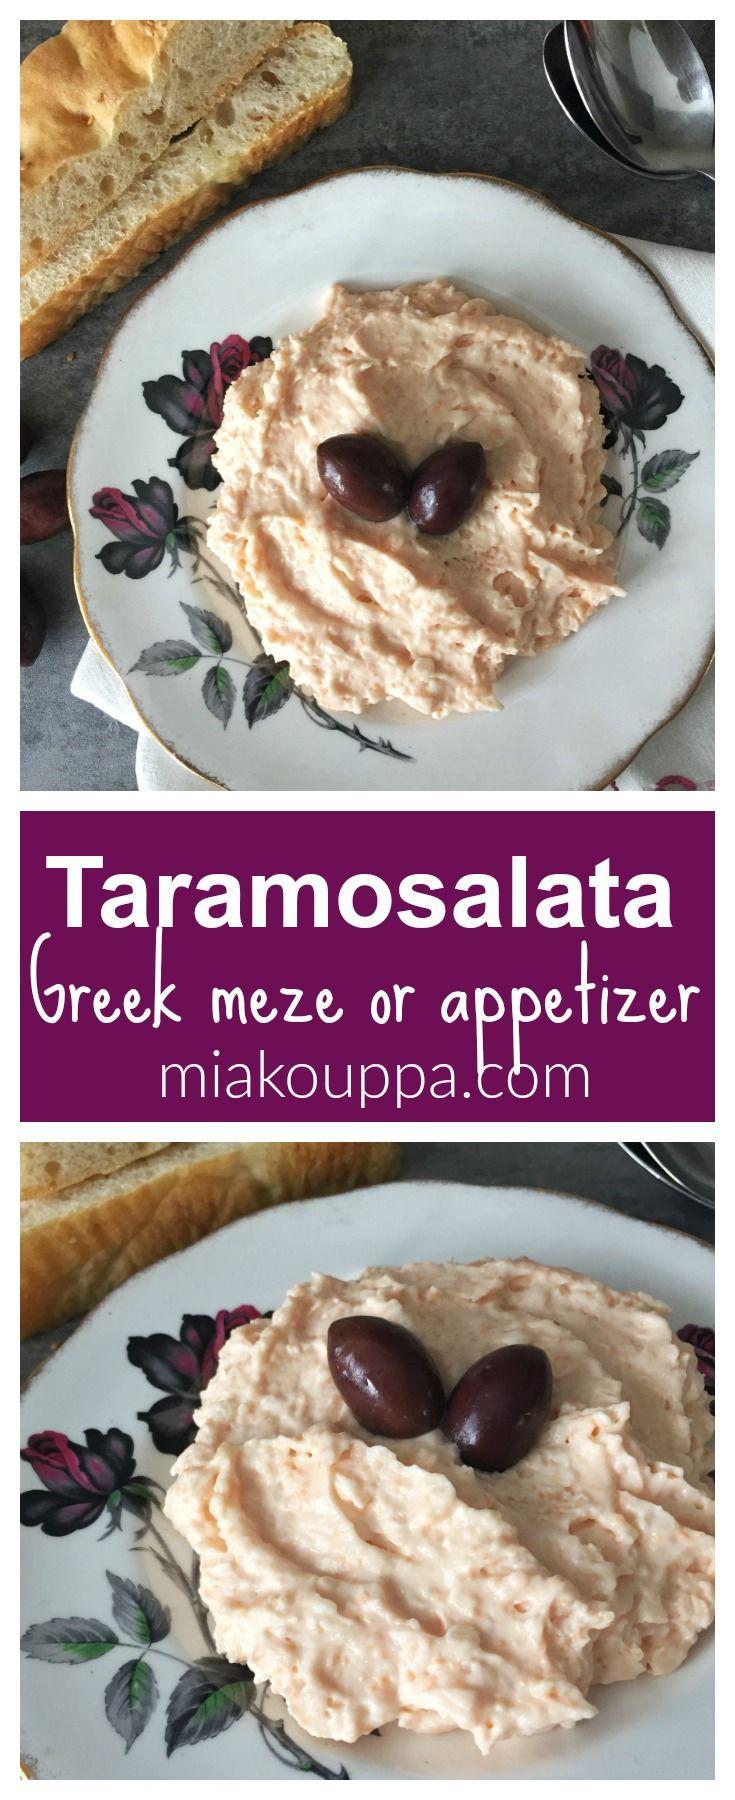 Taramosalata  (Ταραµοσαλάτα), a Greek Traditional maze.  Try this creamy, dreamy and perfect recipe :)  #Greek #meze #dip #taramosalata #nistisima